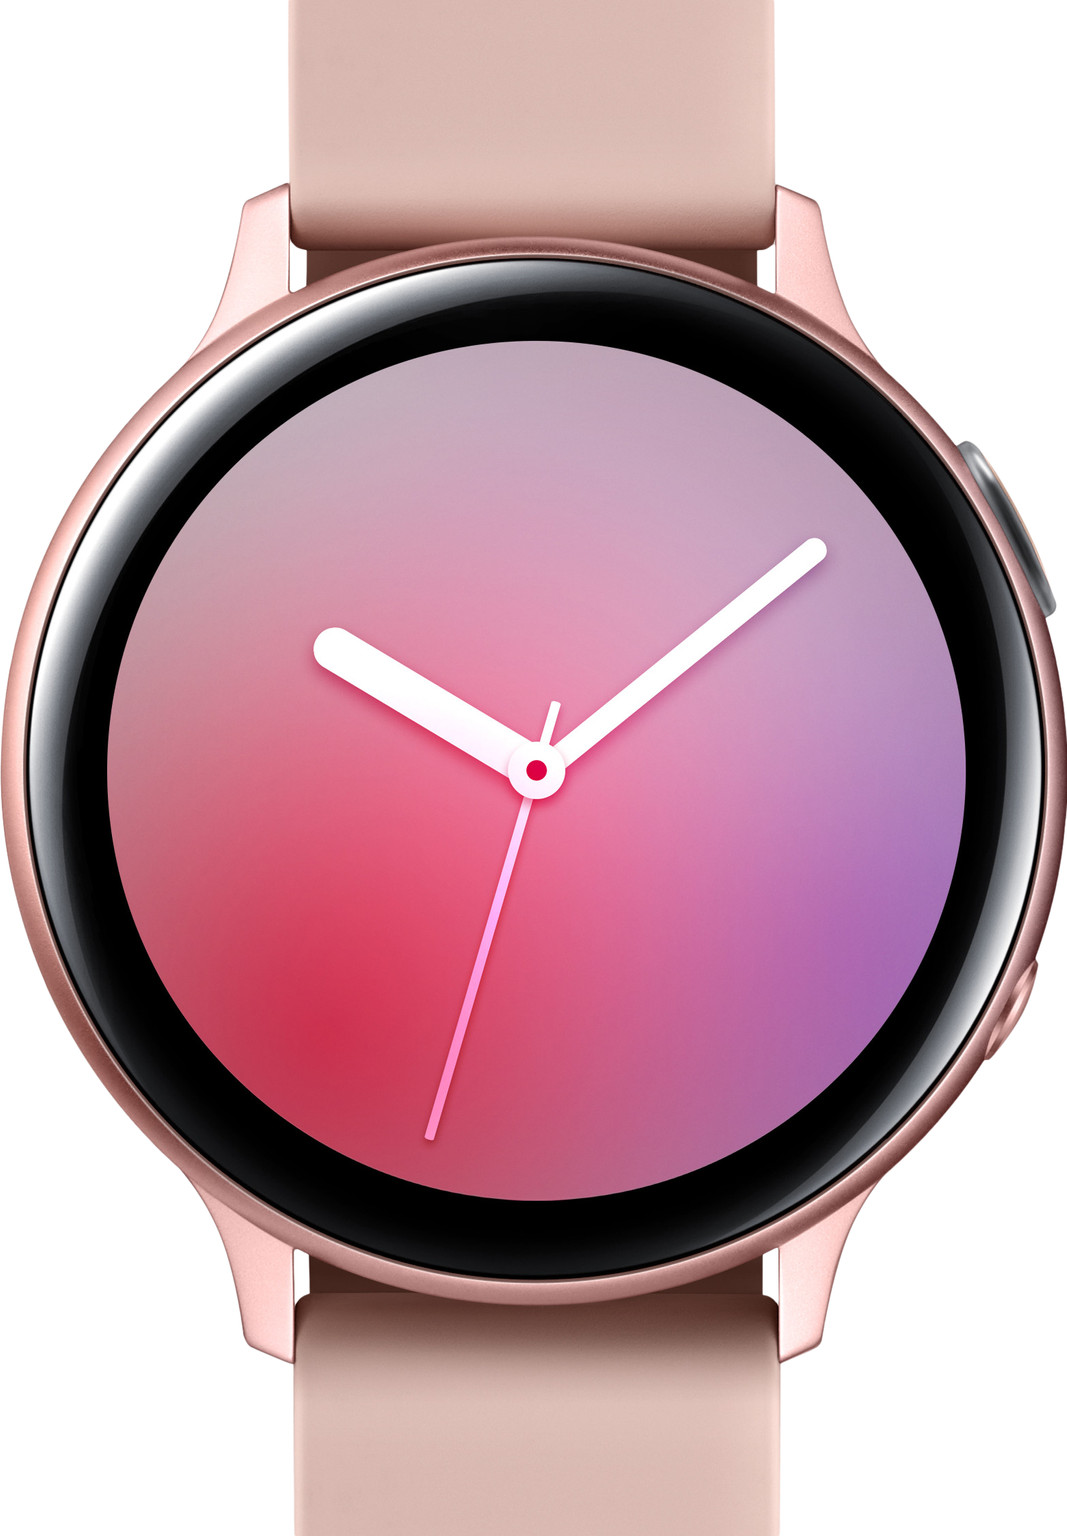 Beste smartwatch Samsung Galaxy Watch Active2 in roségoud